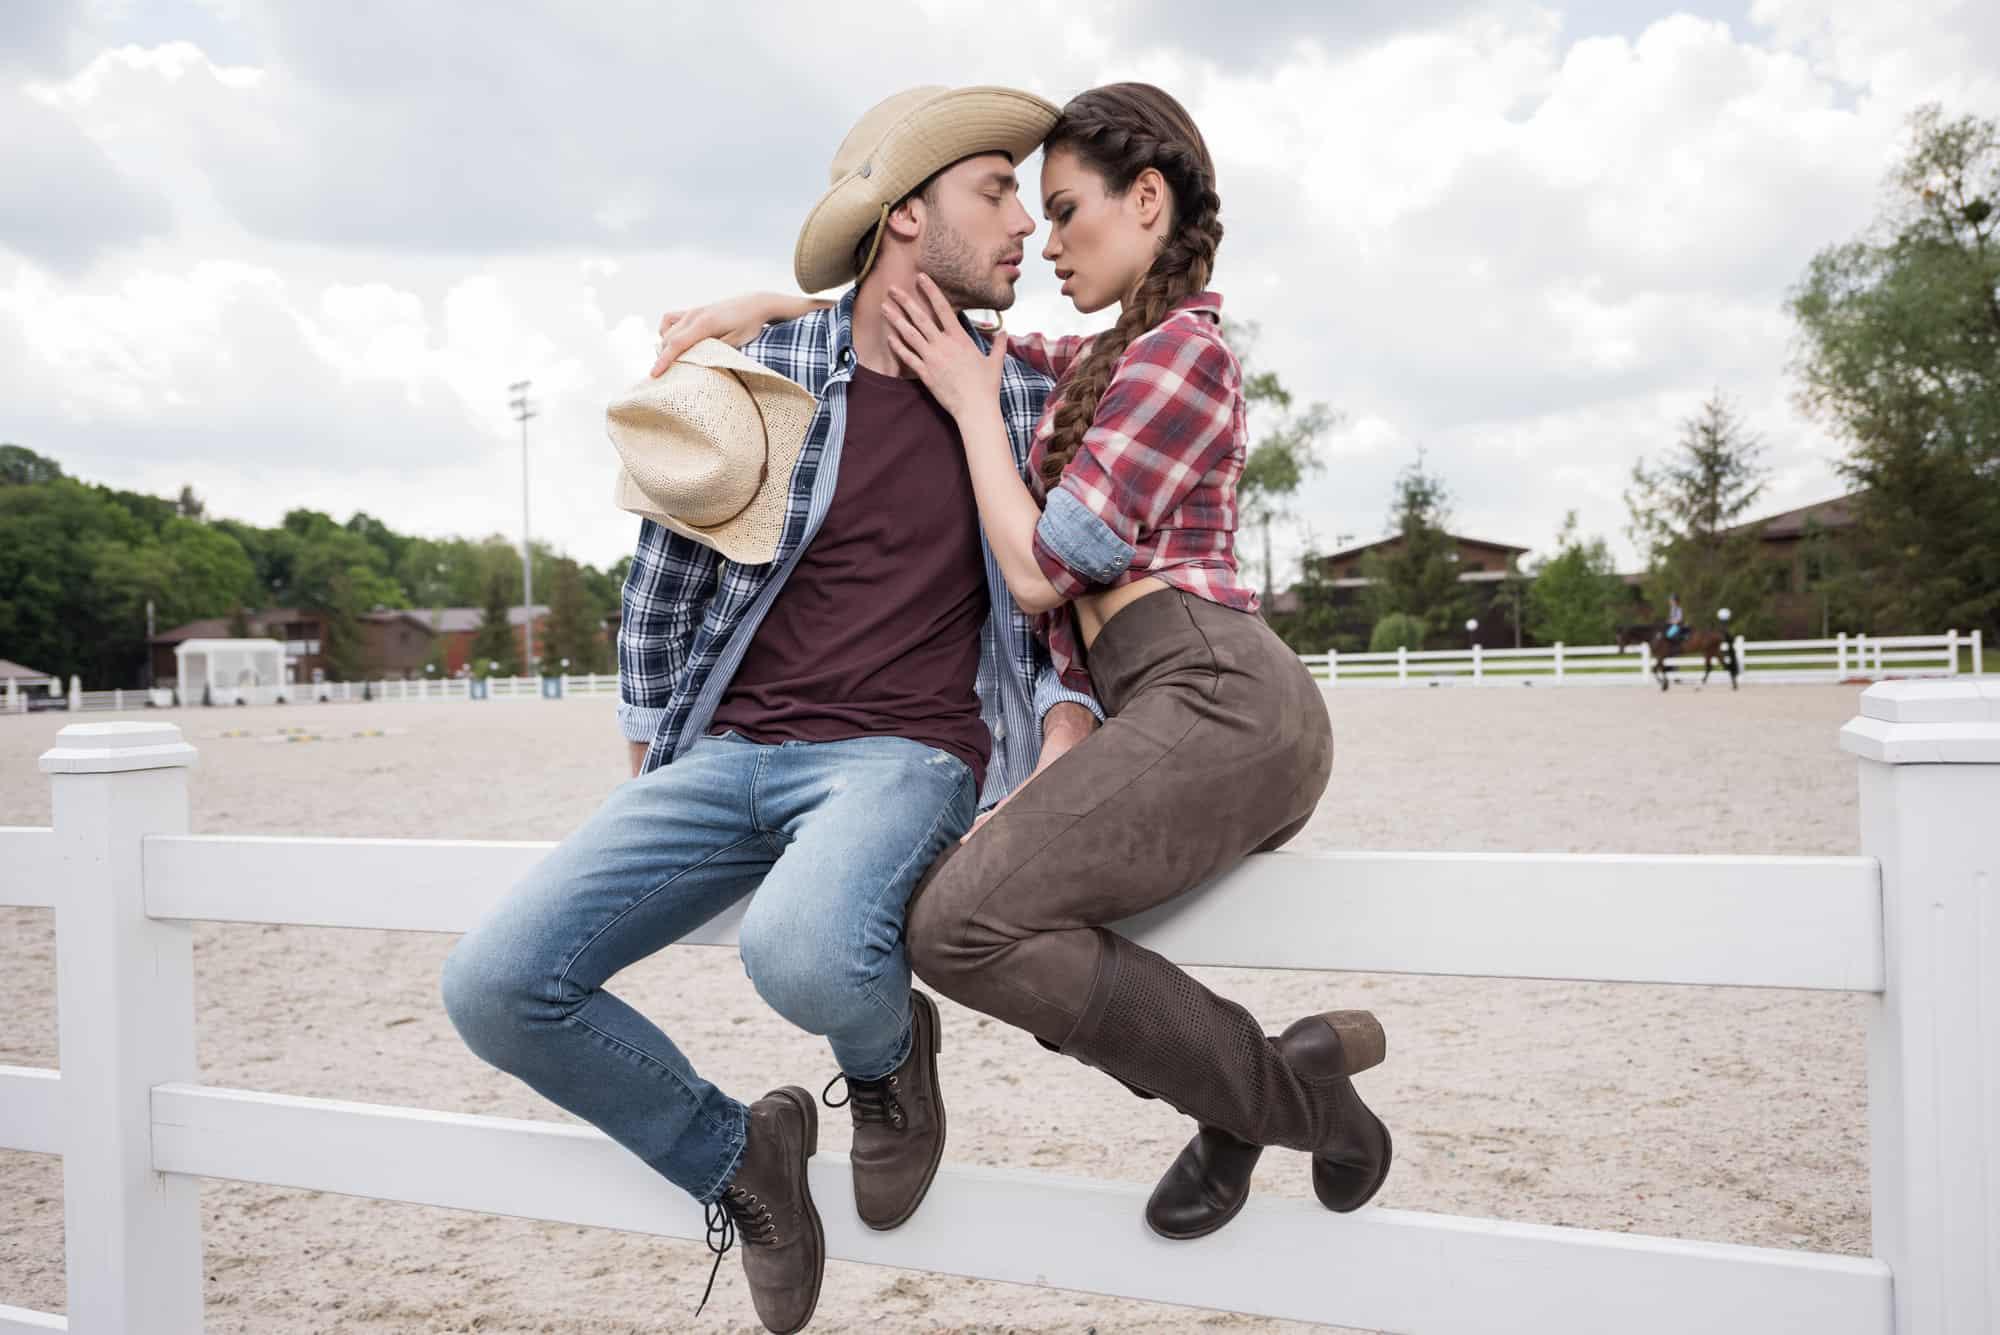 Country folk dating